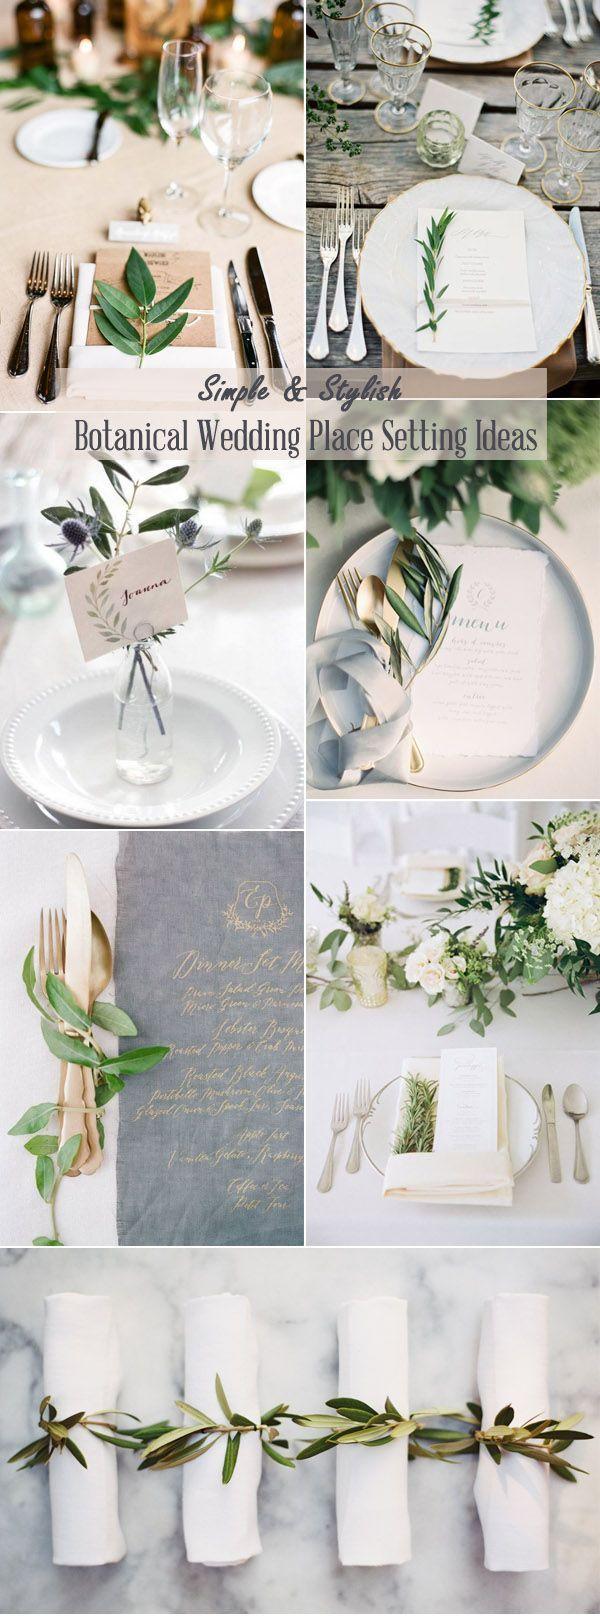 Küchenideen 2018 bilder  best verlobung images on pinterest  weddings decorations and